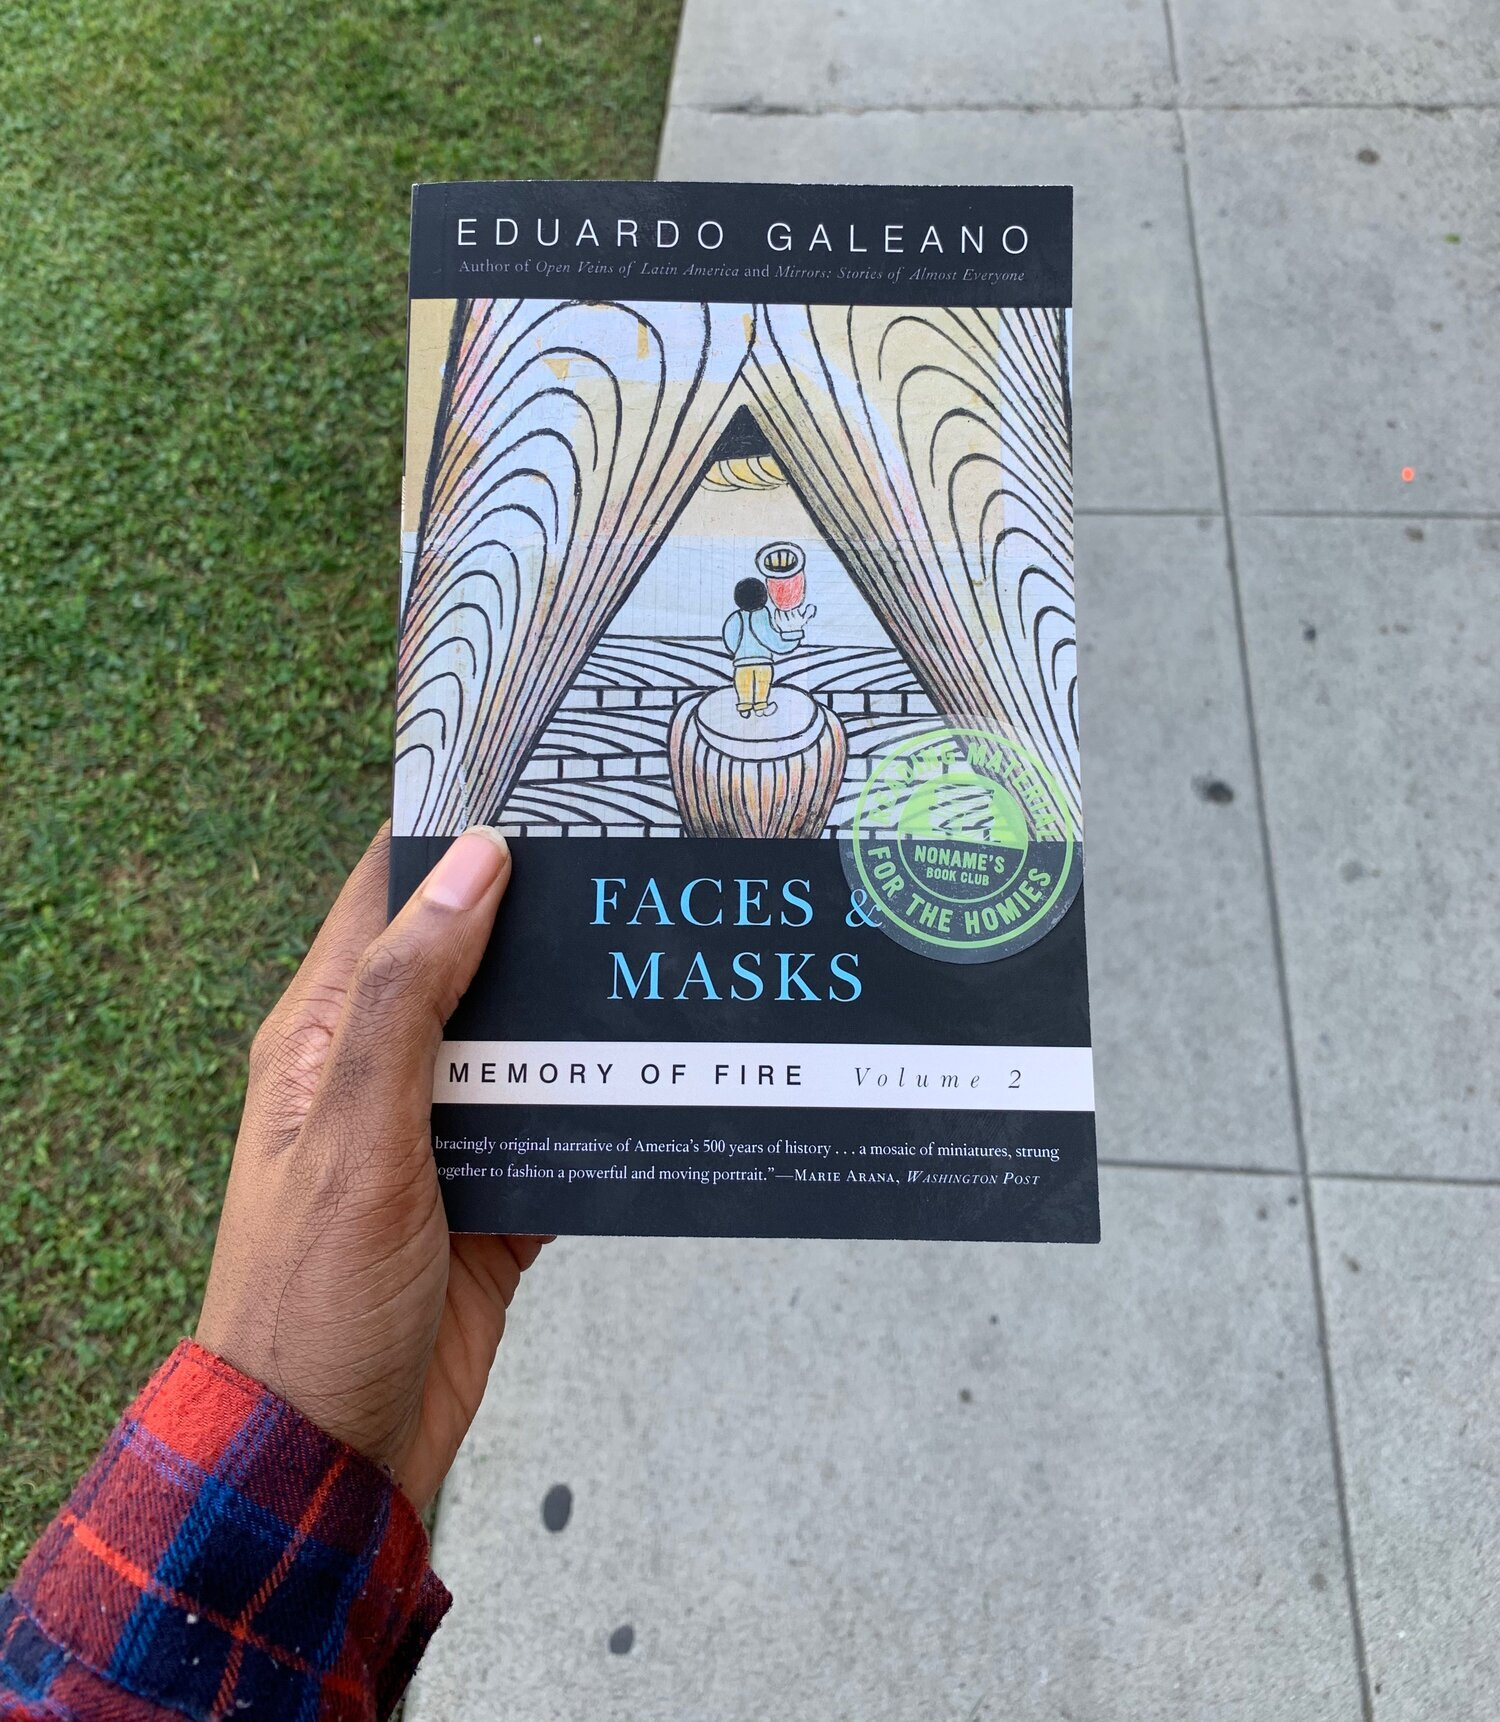 Faces and Masks: Volume 2-Eduardo galeano -